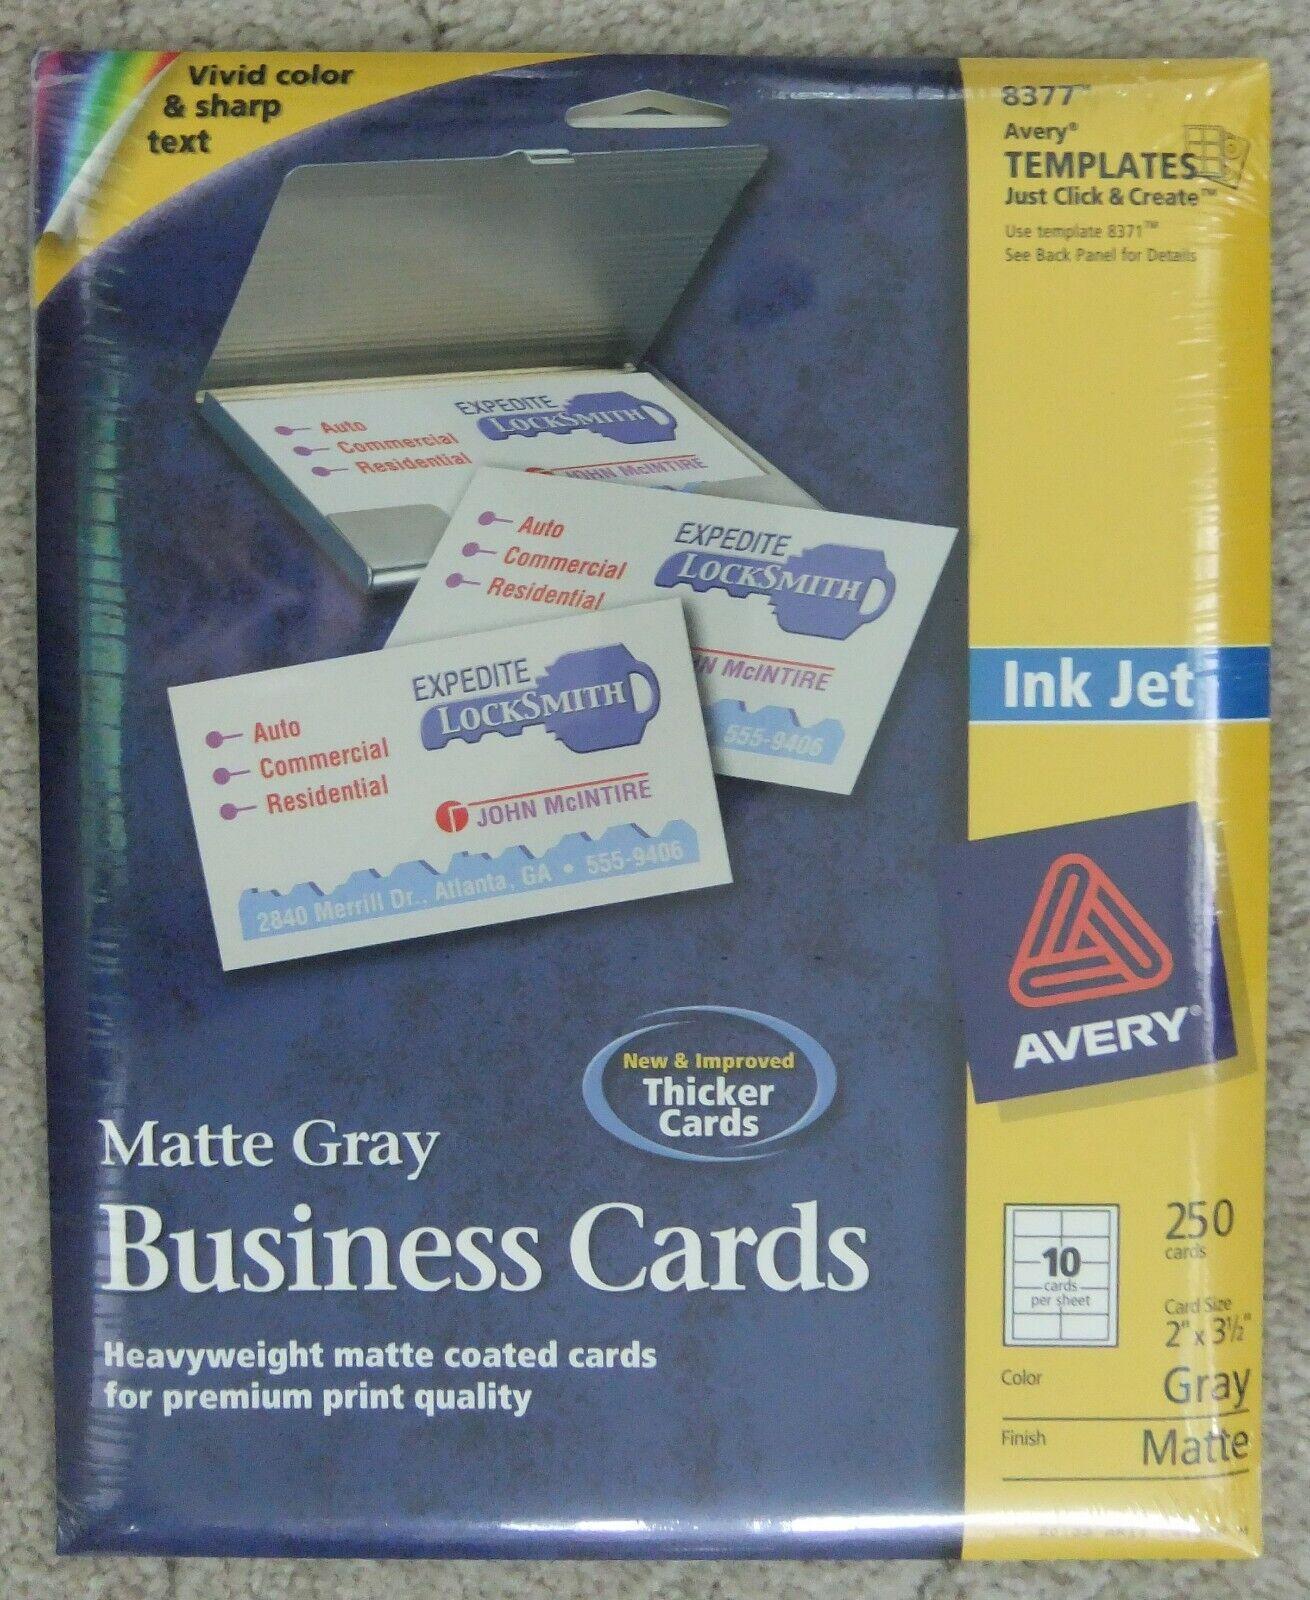 Avery Inkjet Gray Business Cards 8377 For Sale Online Ebay